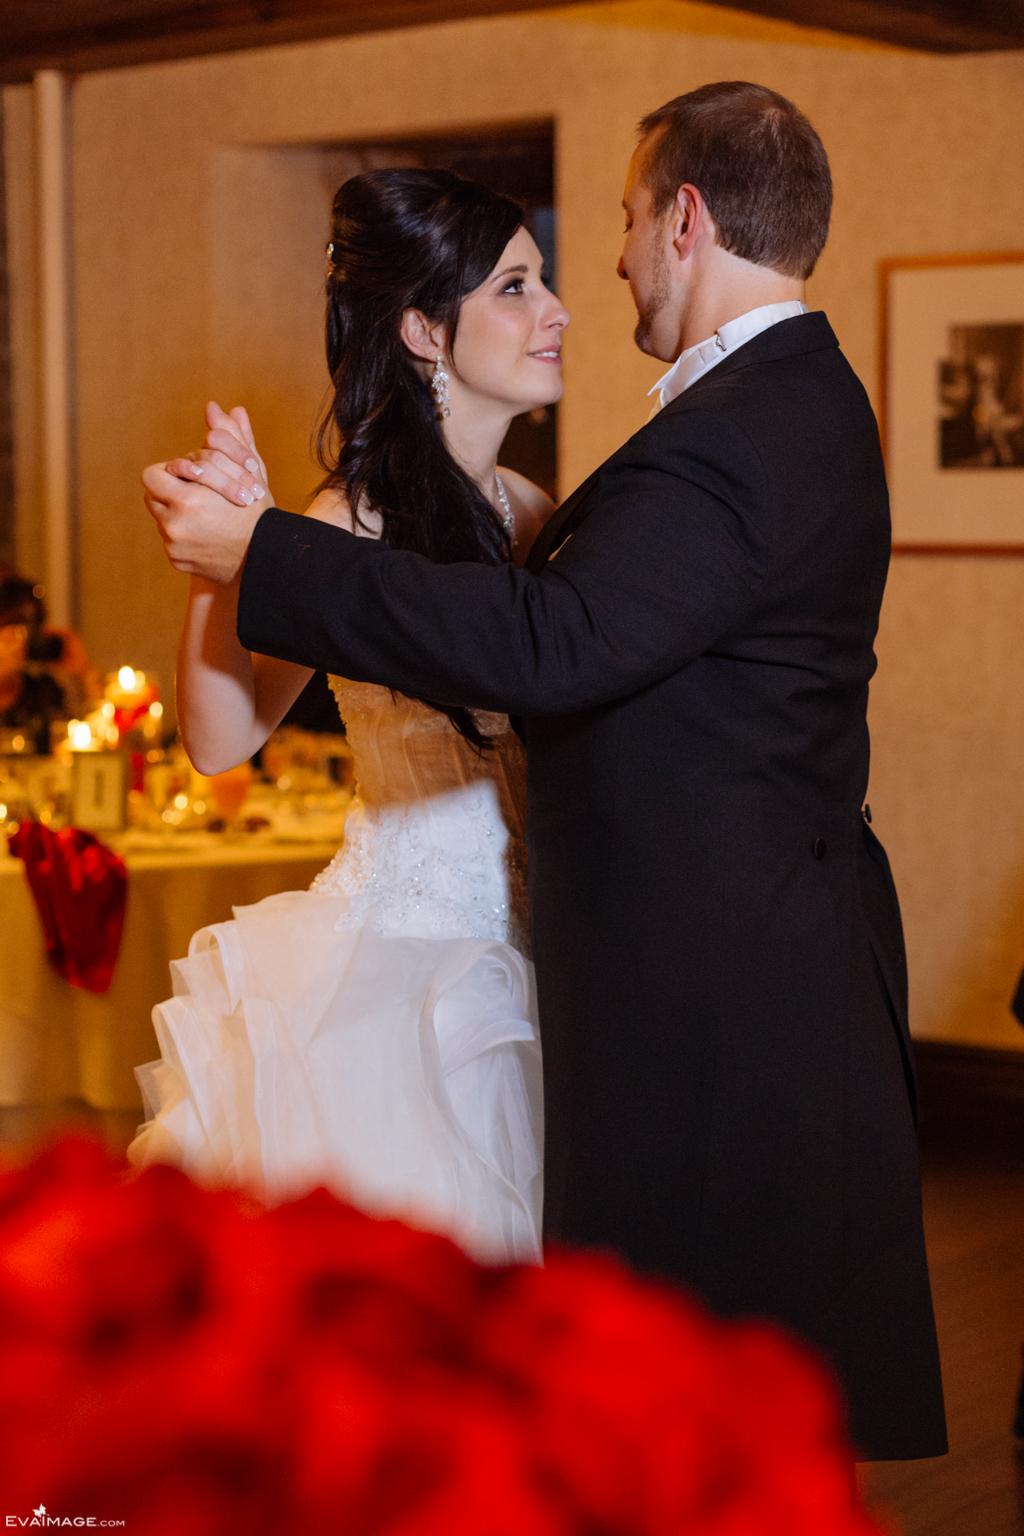 Ancaster_Mill_Wedding_EvaImage-607.jpg